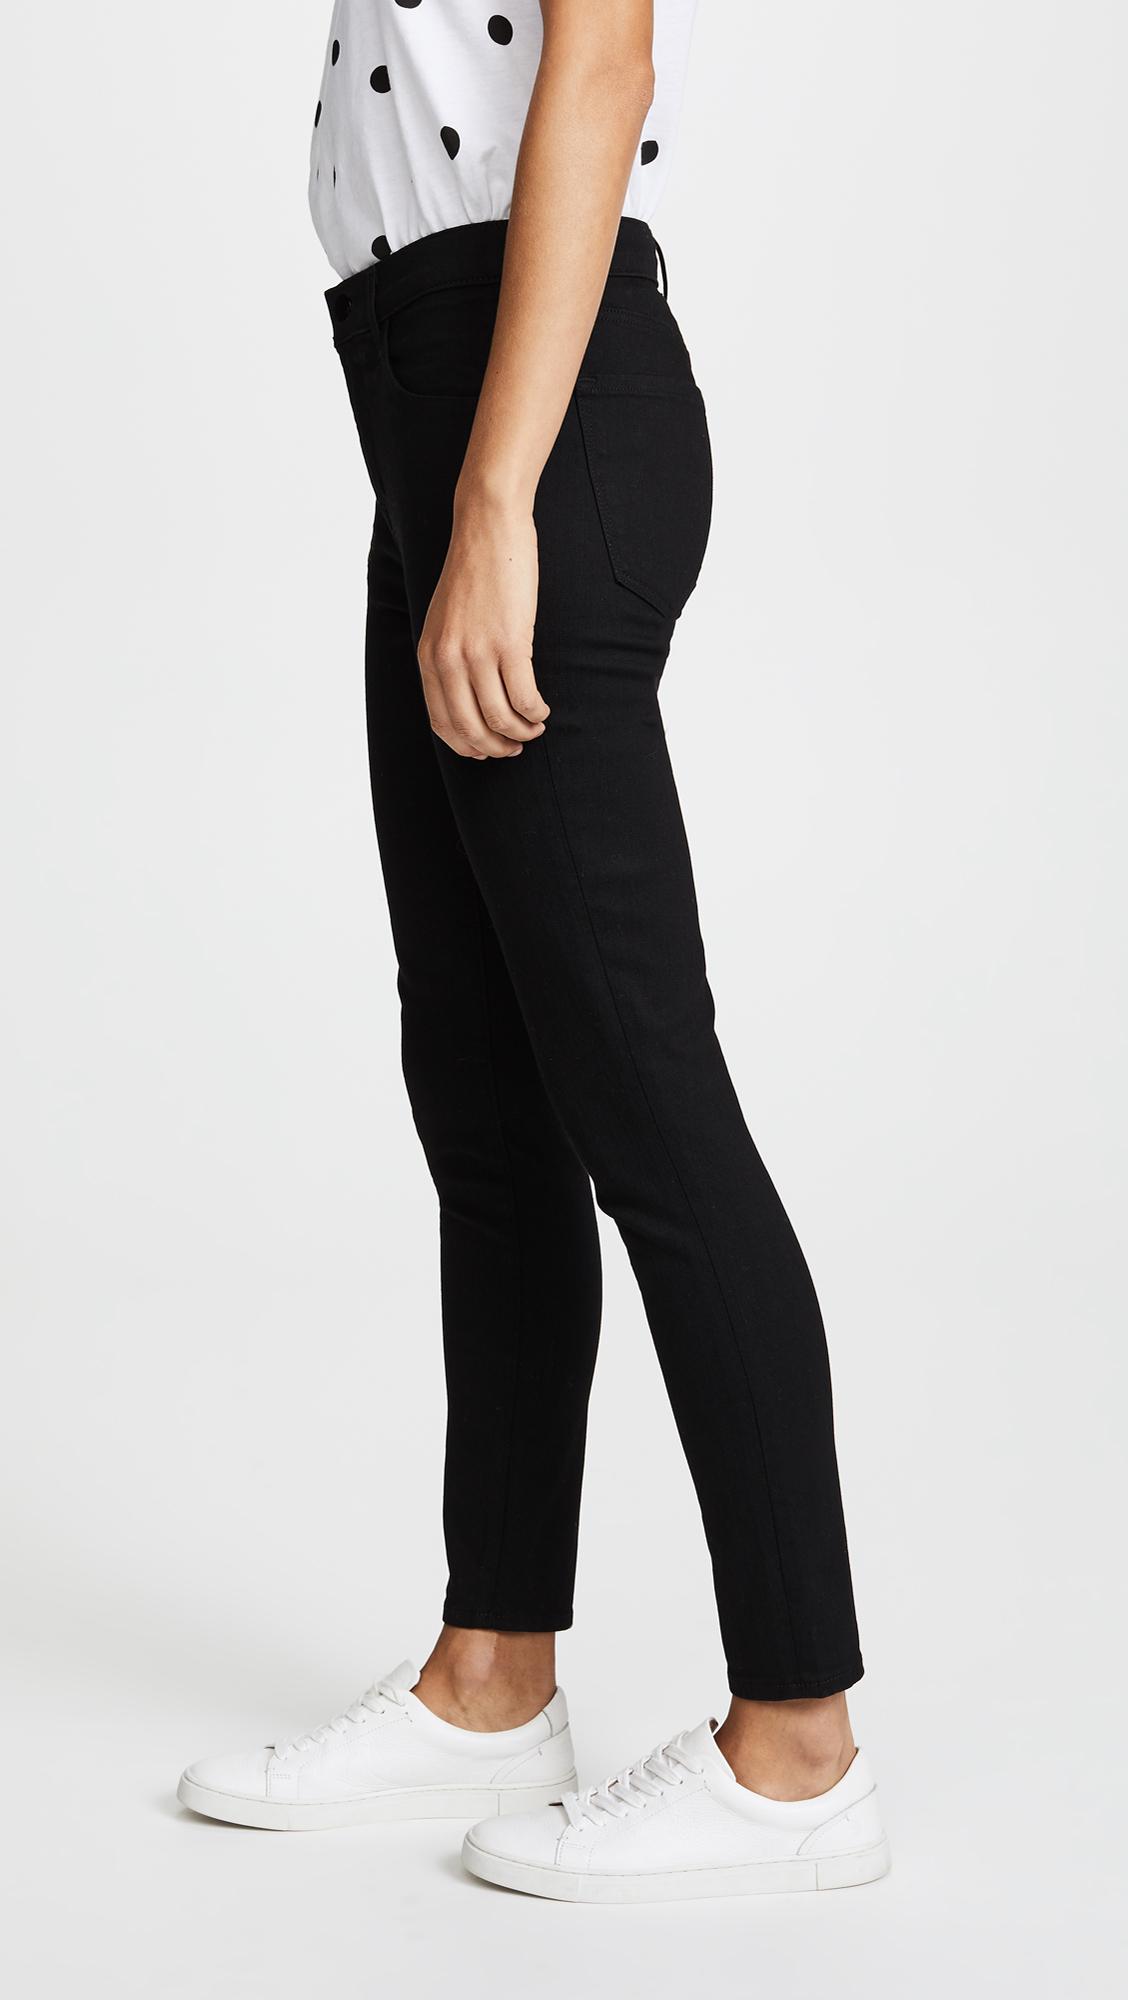 91b15c1fde35 J Brand High Rise Alana Jeans